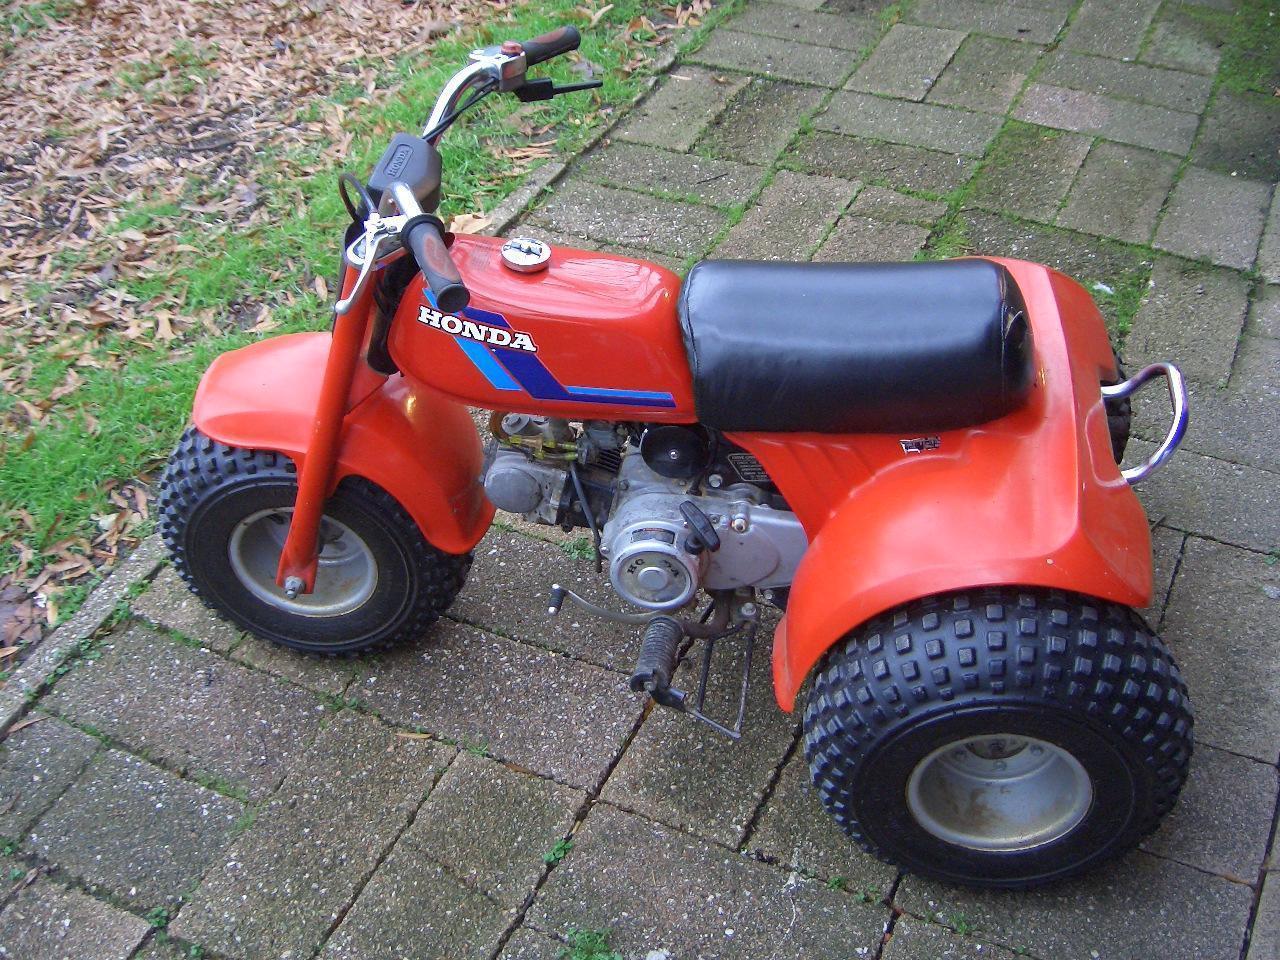 Honda Atc 70 : The honda at motorbikespecs motorcycle